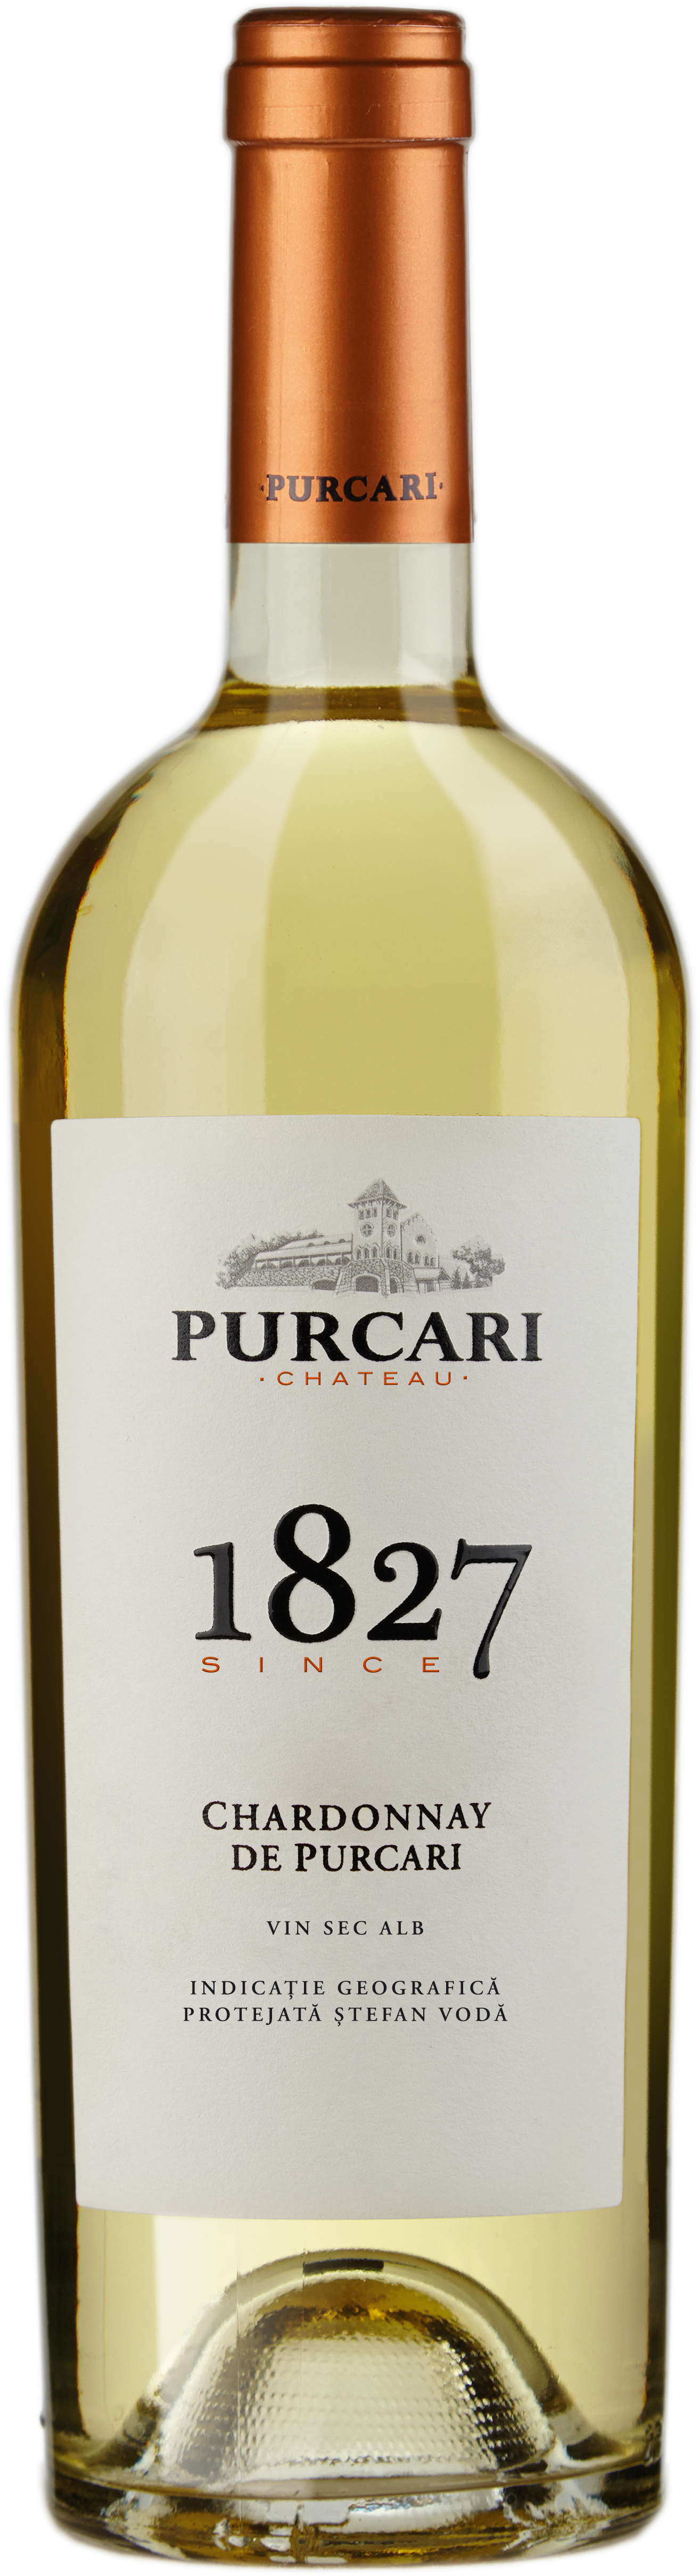 Vin Chardonnay Sec, Purcari 1827, 0.75L [0]